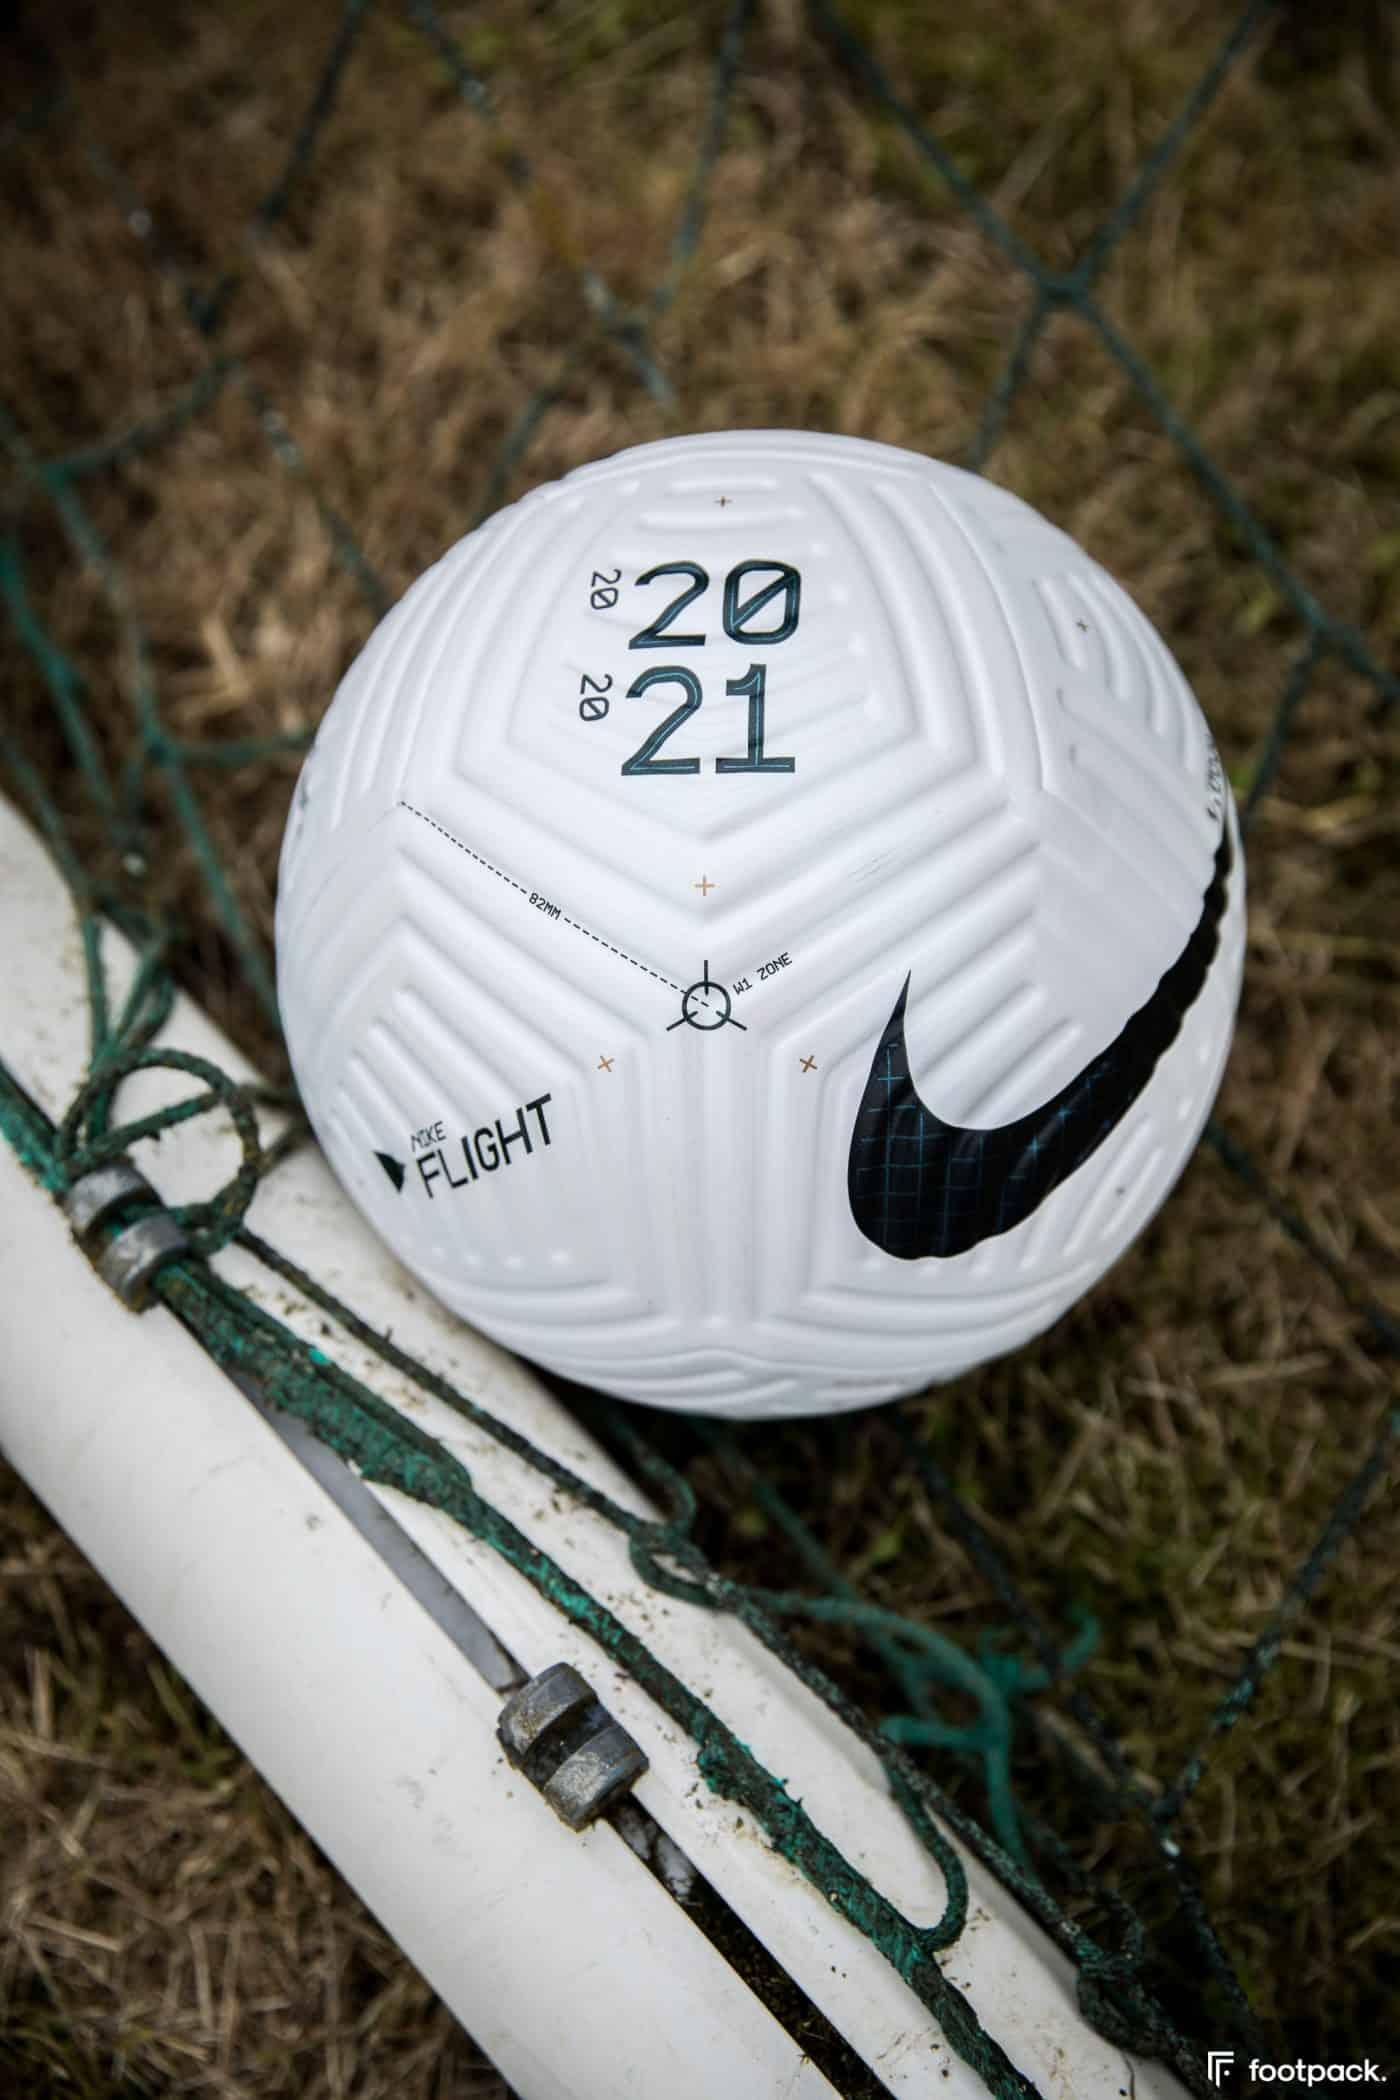 ballon-nike-flight-premier-league-serie-a-footpack-23